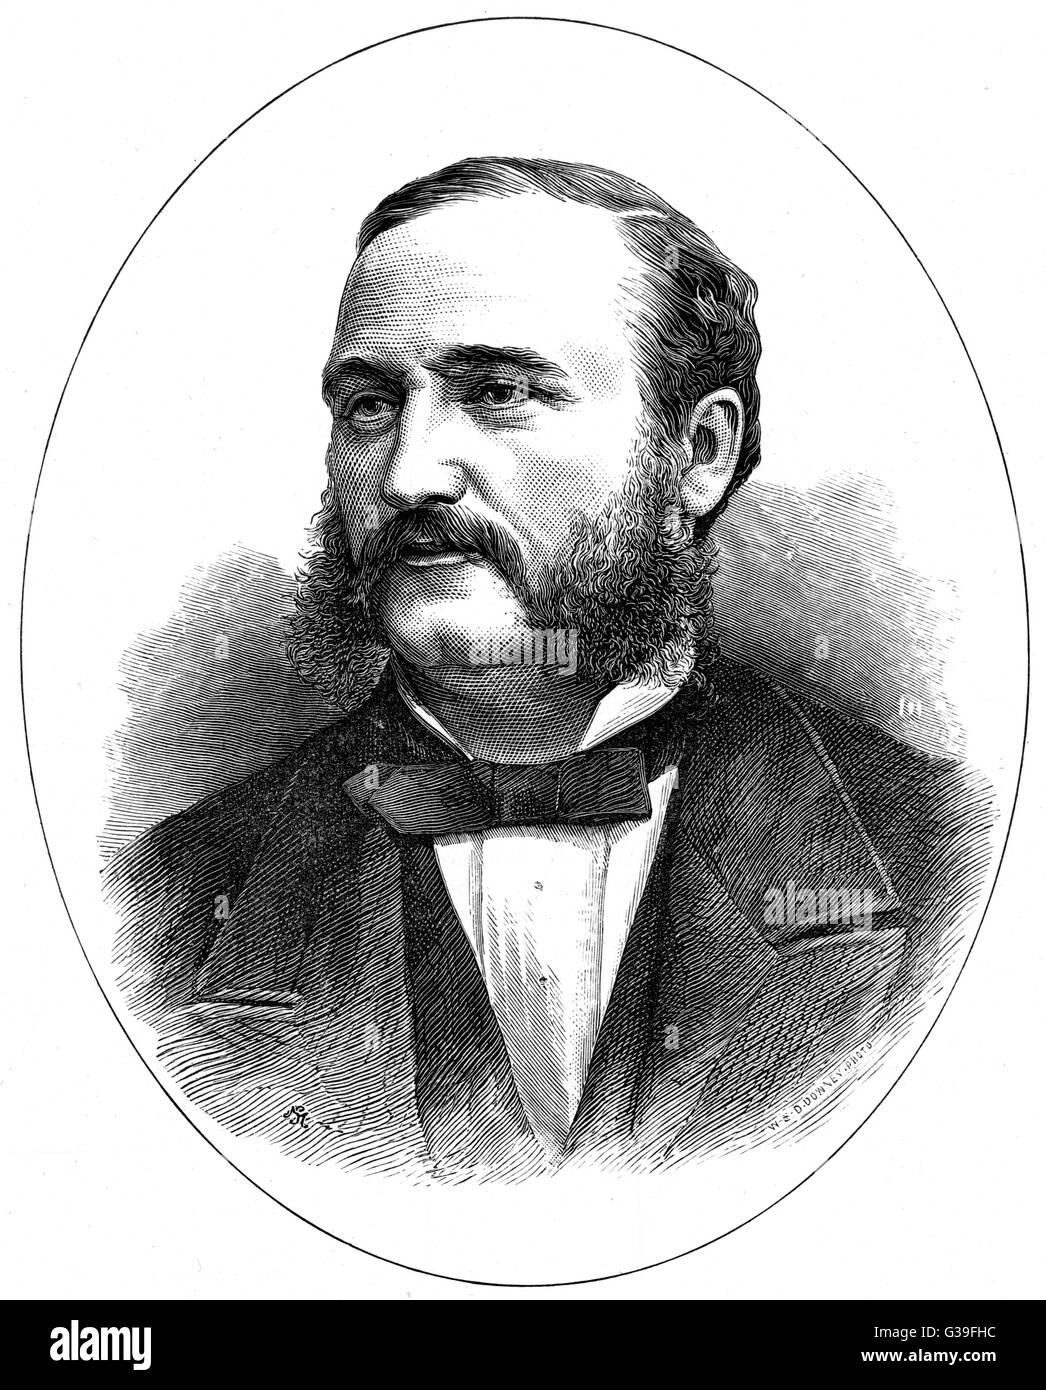 IRA DAVID SANKEY  the American evangelist        Date: 1840 - 1908 - Stock Image